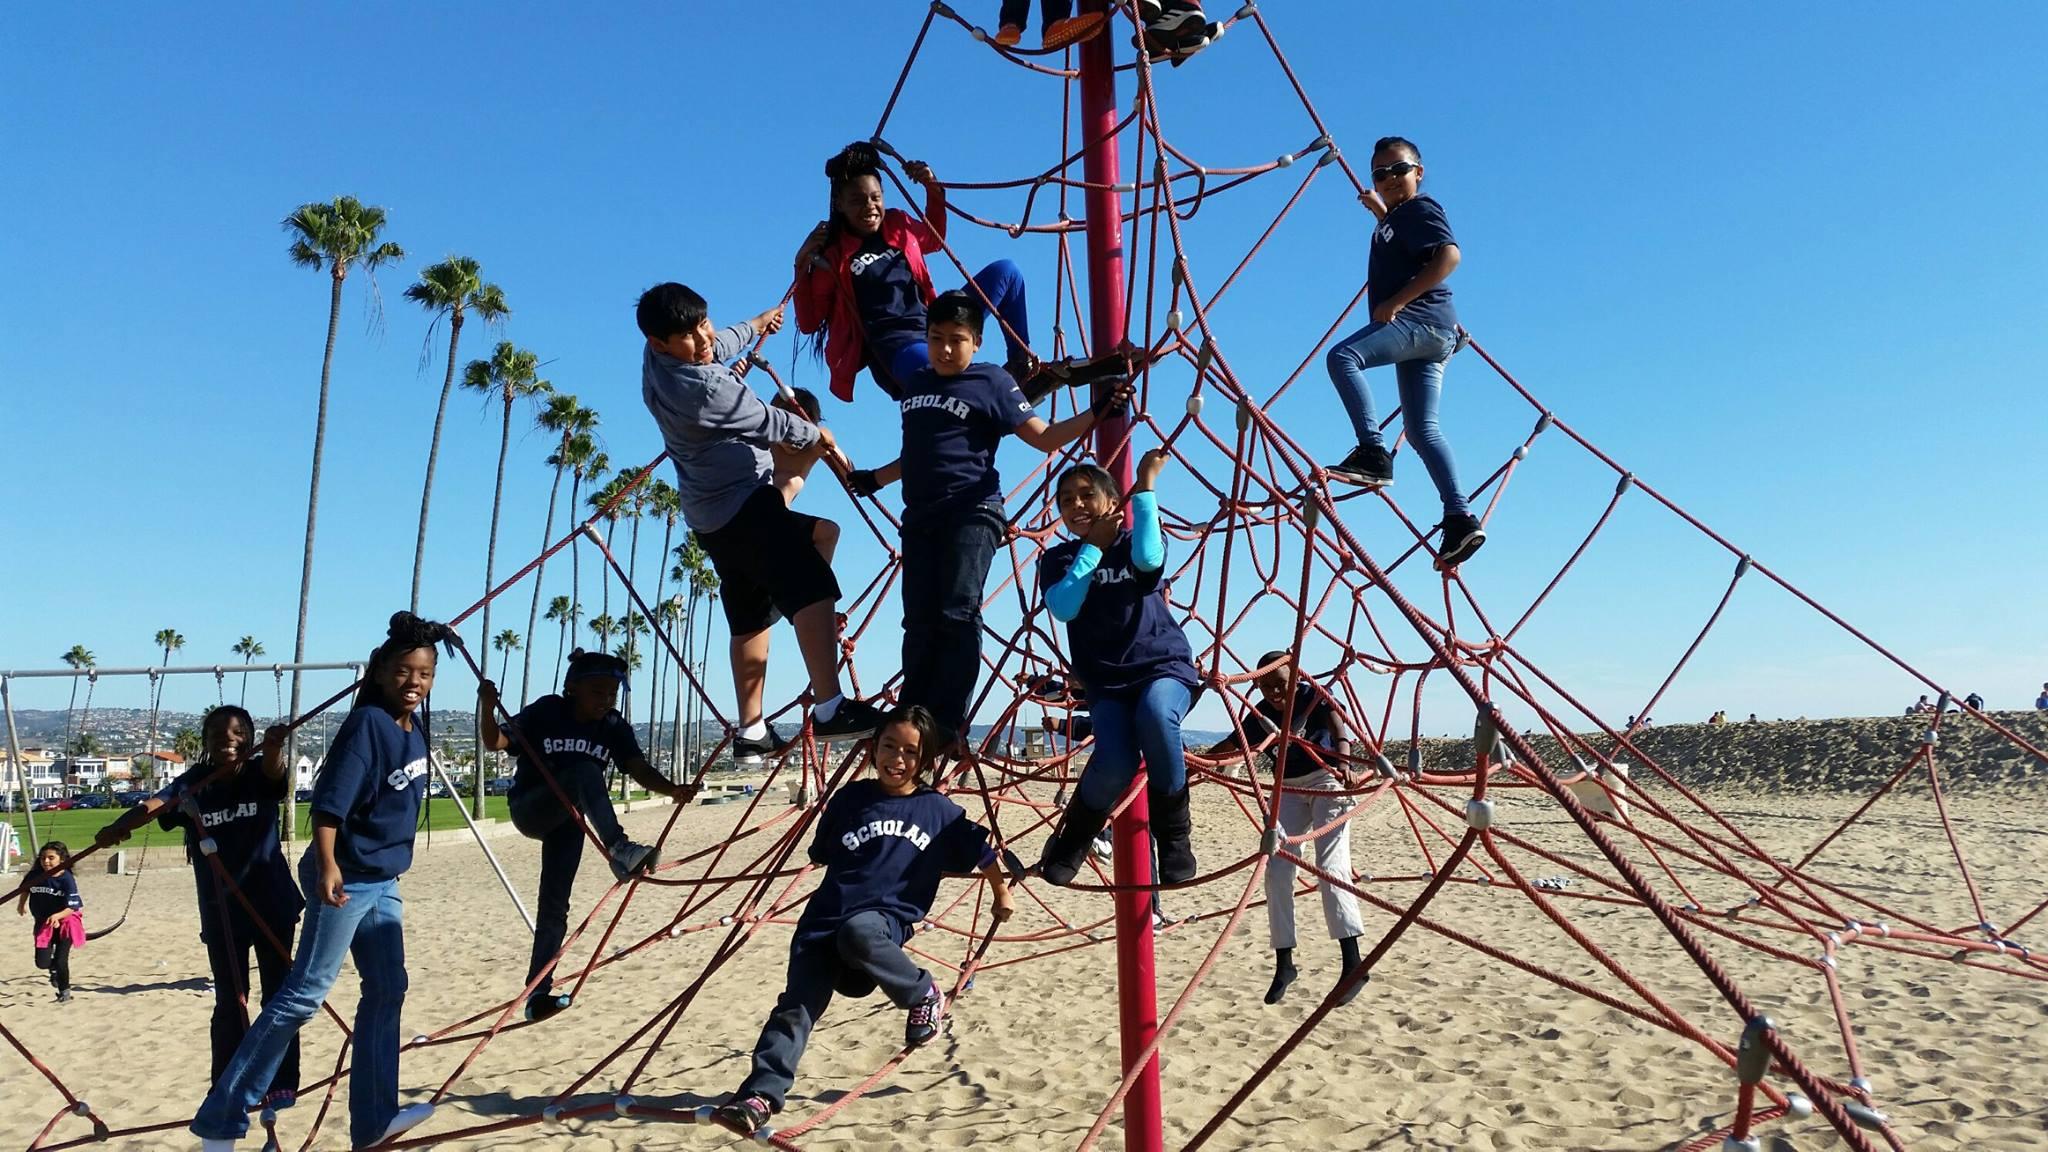 climbing the ropes